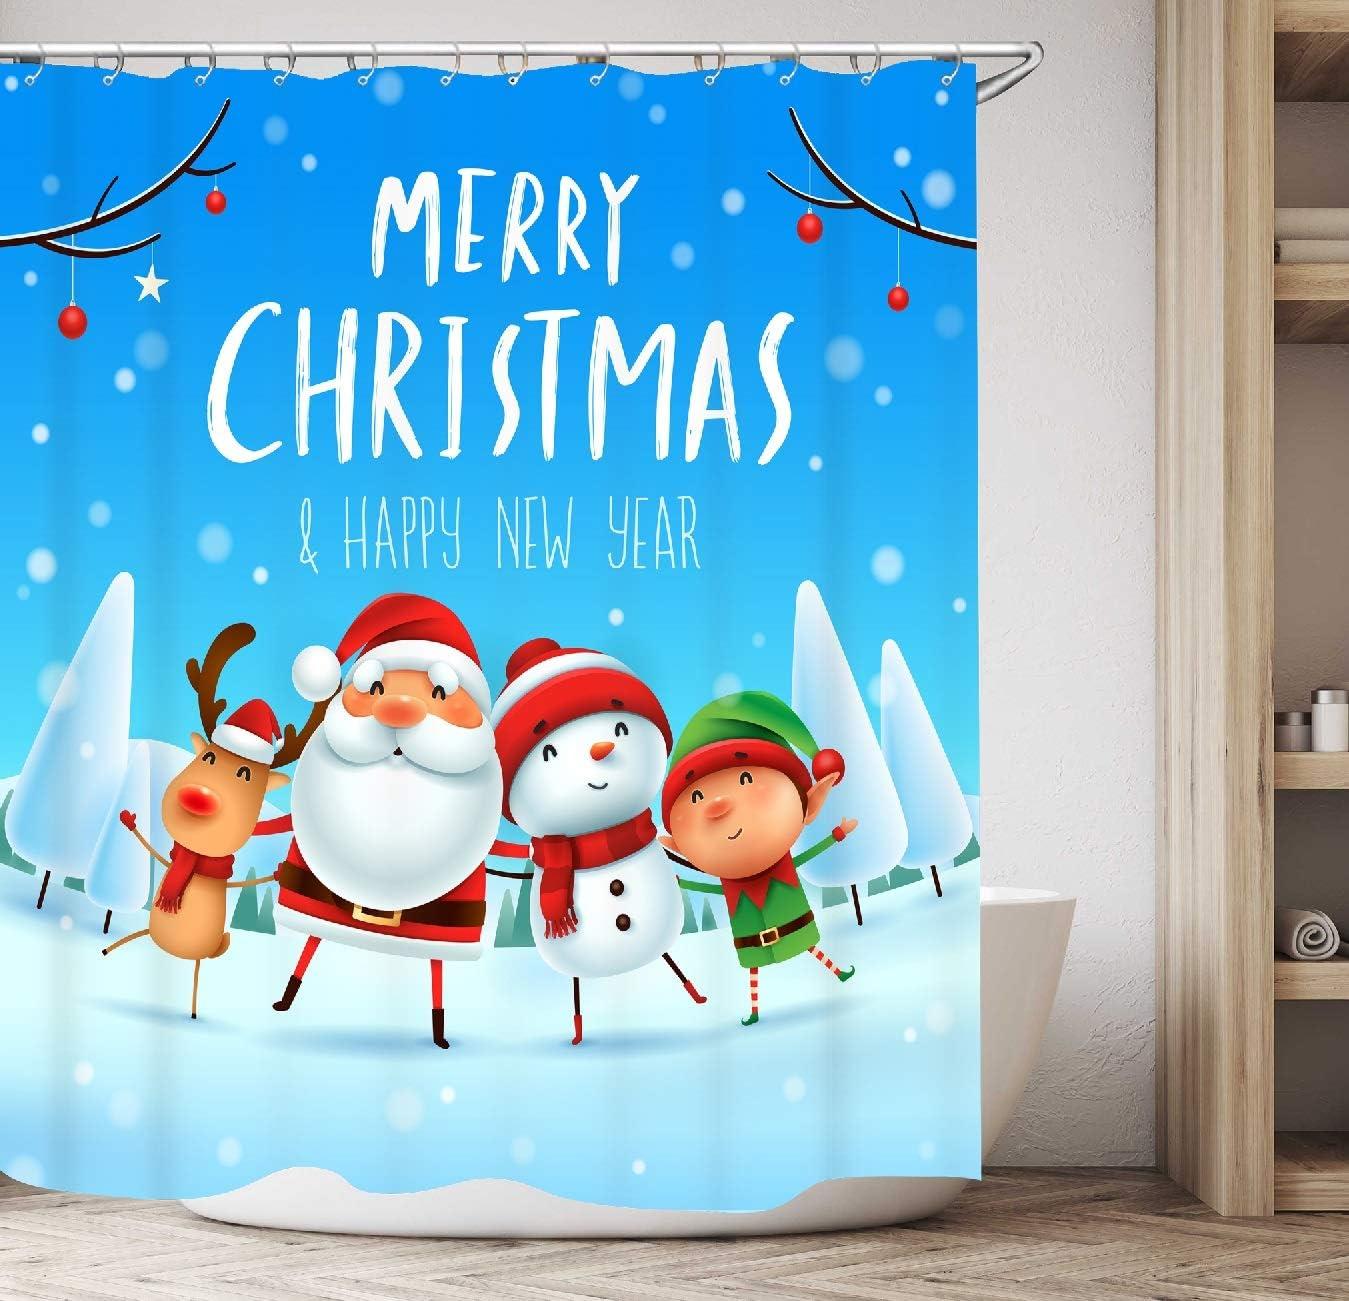 Merry Christmas Santa Claus Shower Curtain Bathroom Polyester Waterproof Fabric